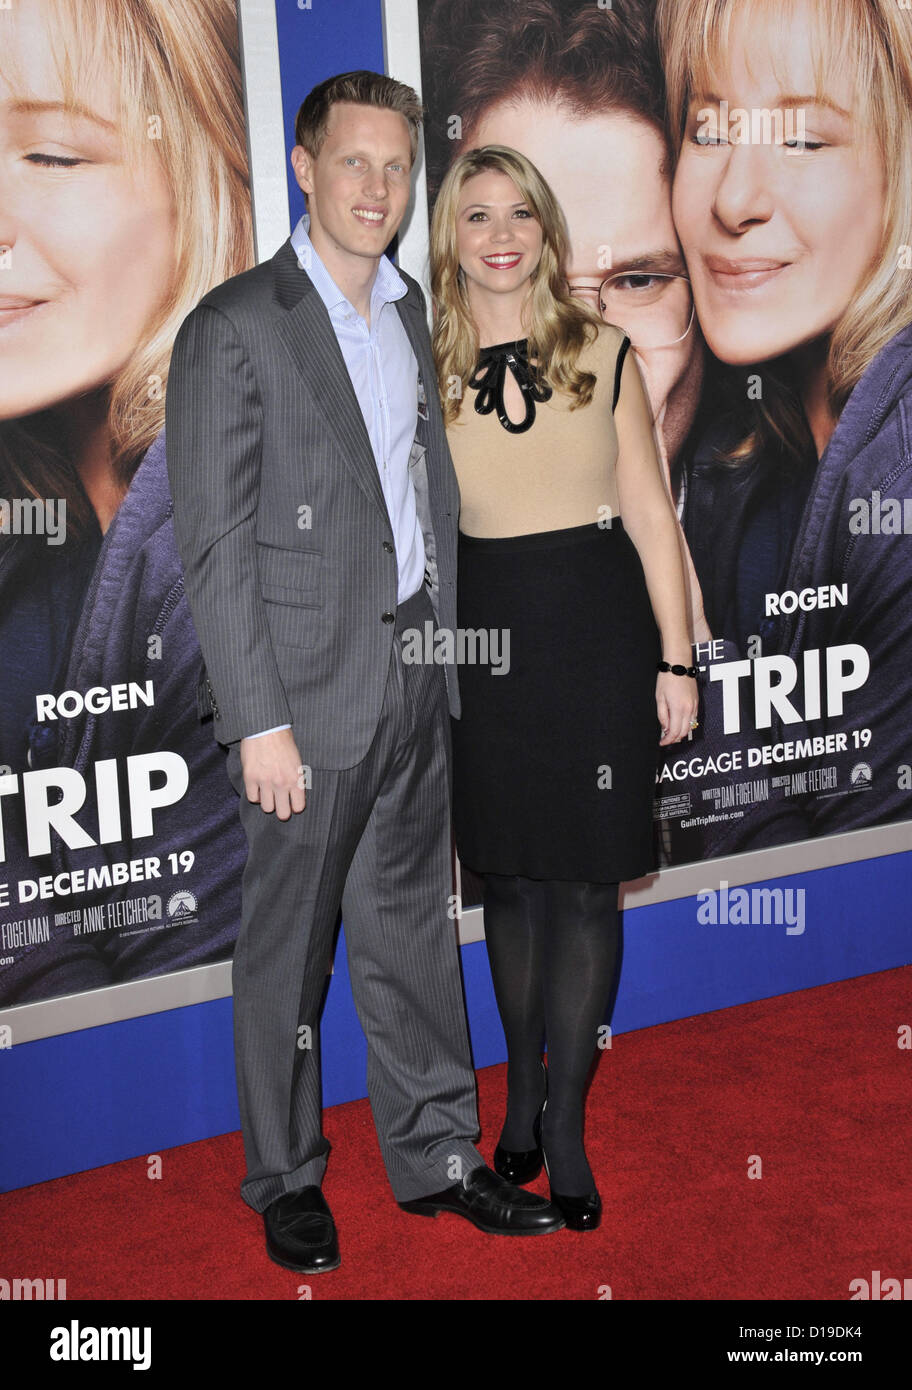 Dec. 11, 2012 - Los Angeles, California, U.S. - David Ellison attending the Los Angeles Premiere of ''The Guilt Stock Photo